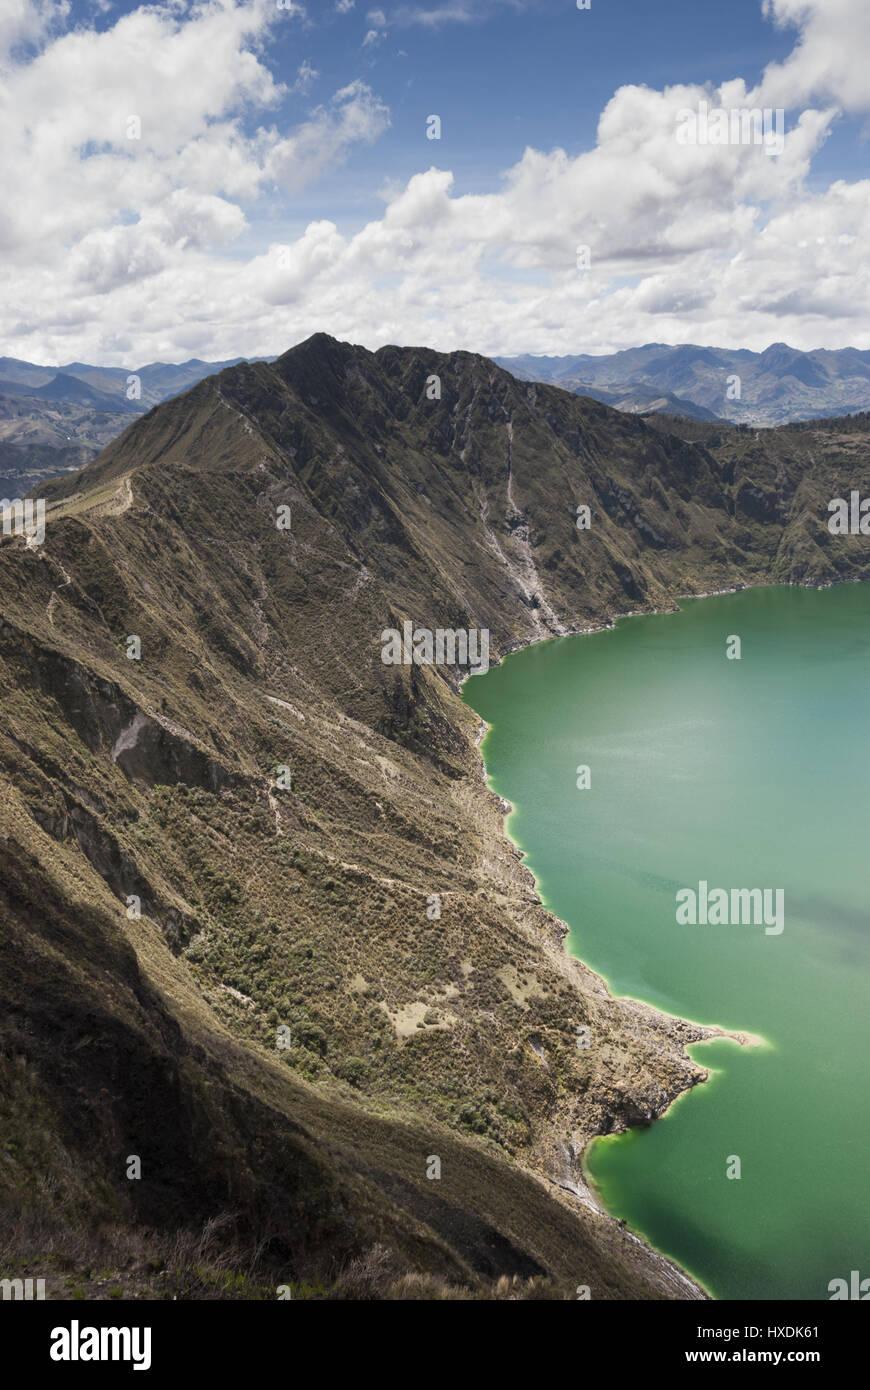 Ecuador, Quilitoa, Crater Lake - Stock Image